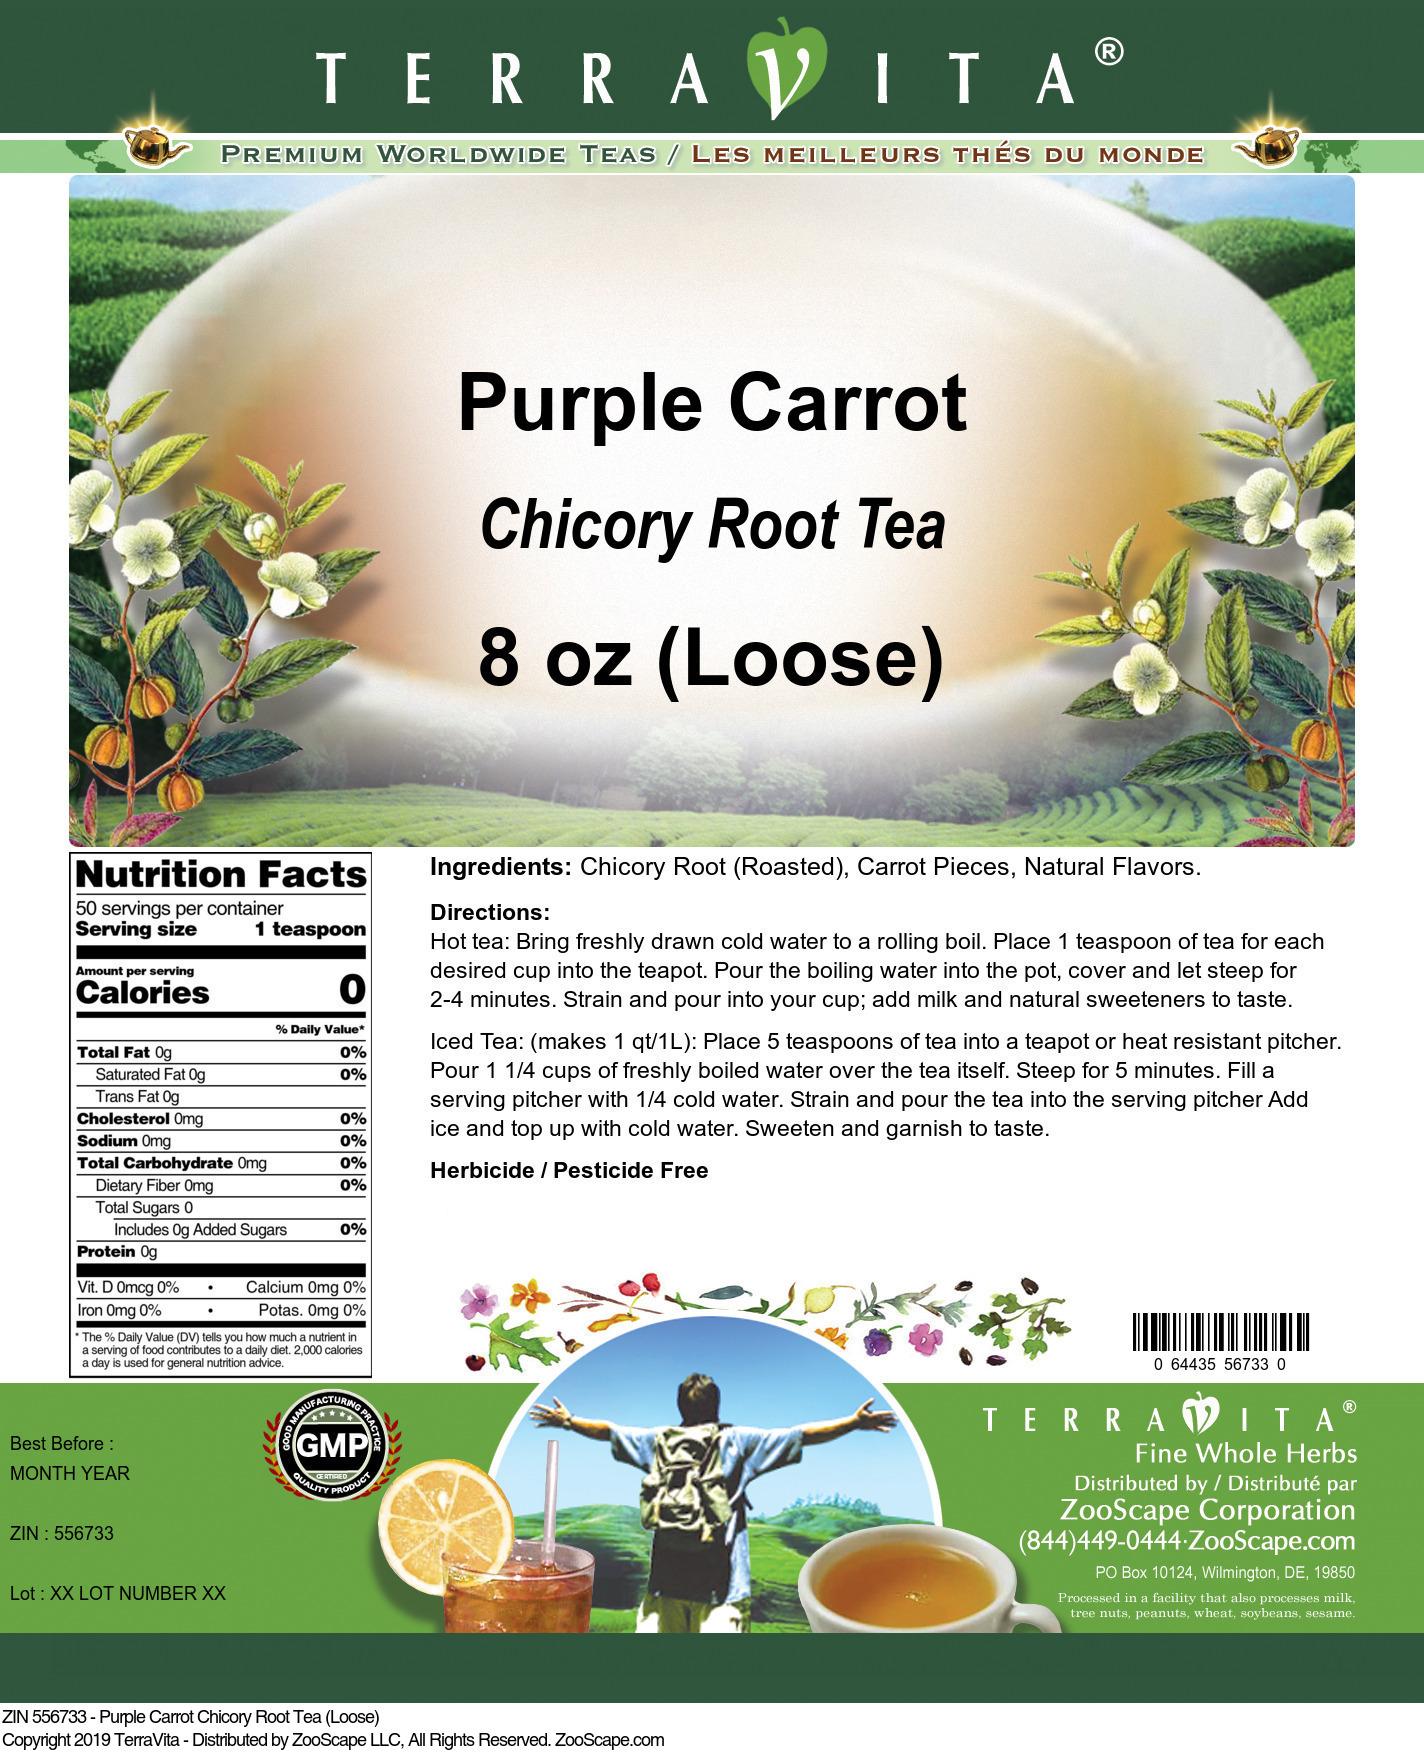 Purple Carrot Chicory Root